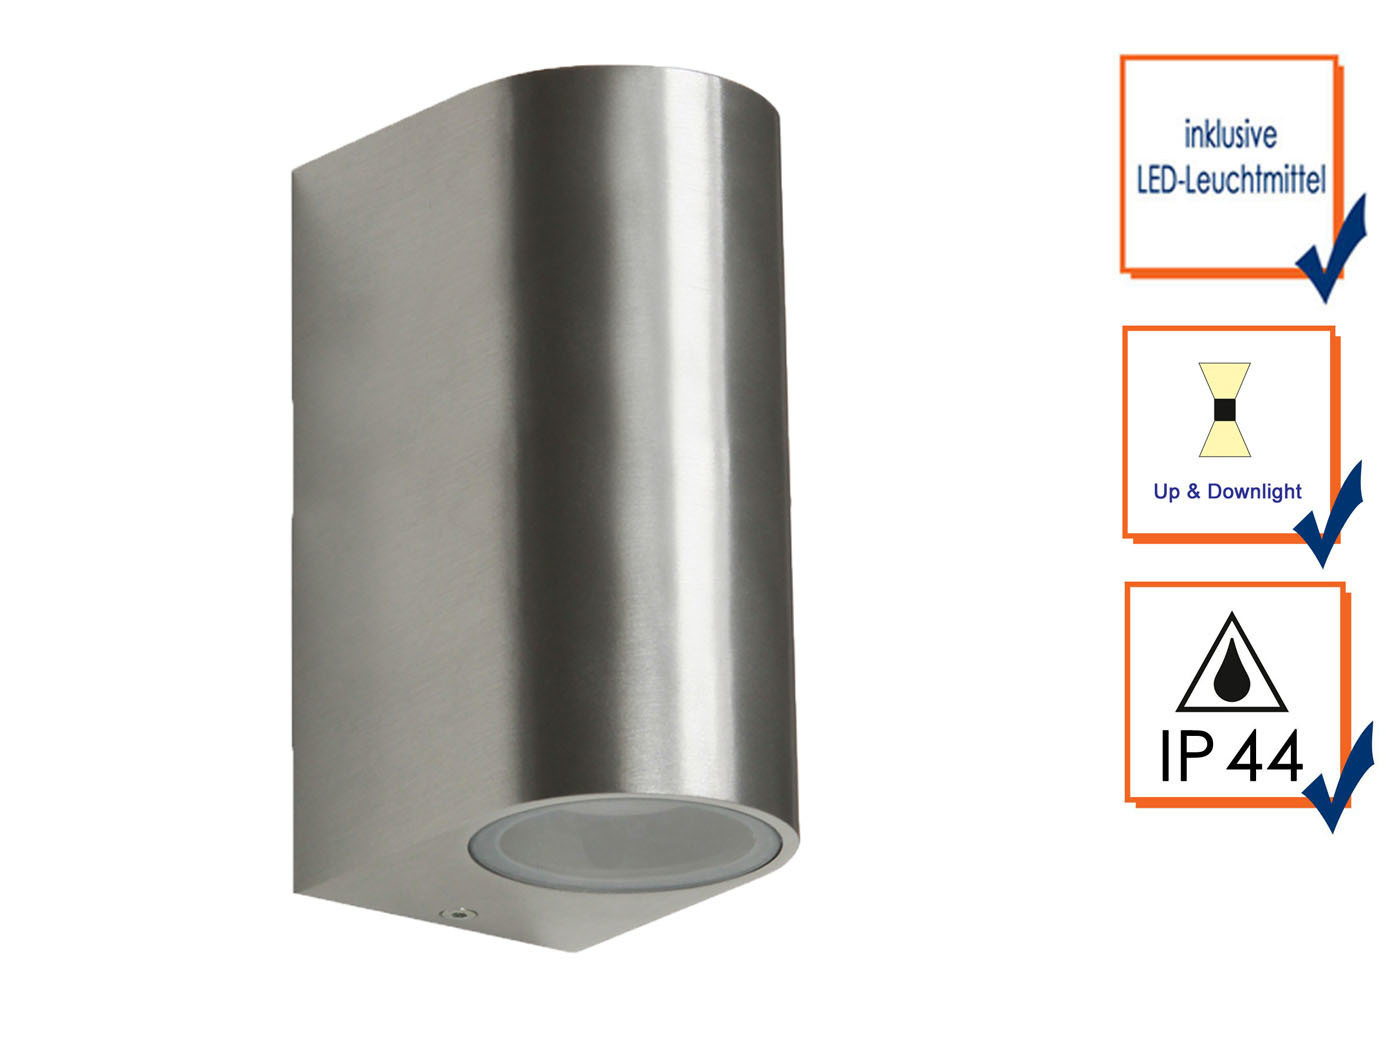 6er Set LED Wandleuchte Wandleuchte Wandleuchte Metall, up downlight, 160Lm, warm, IP44 11acc9